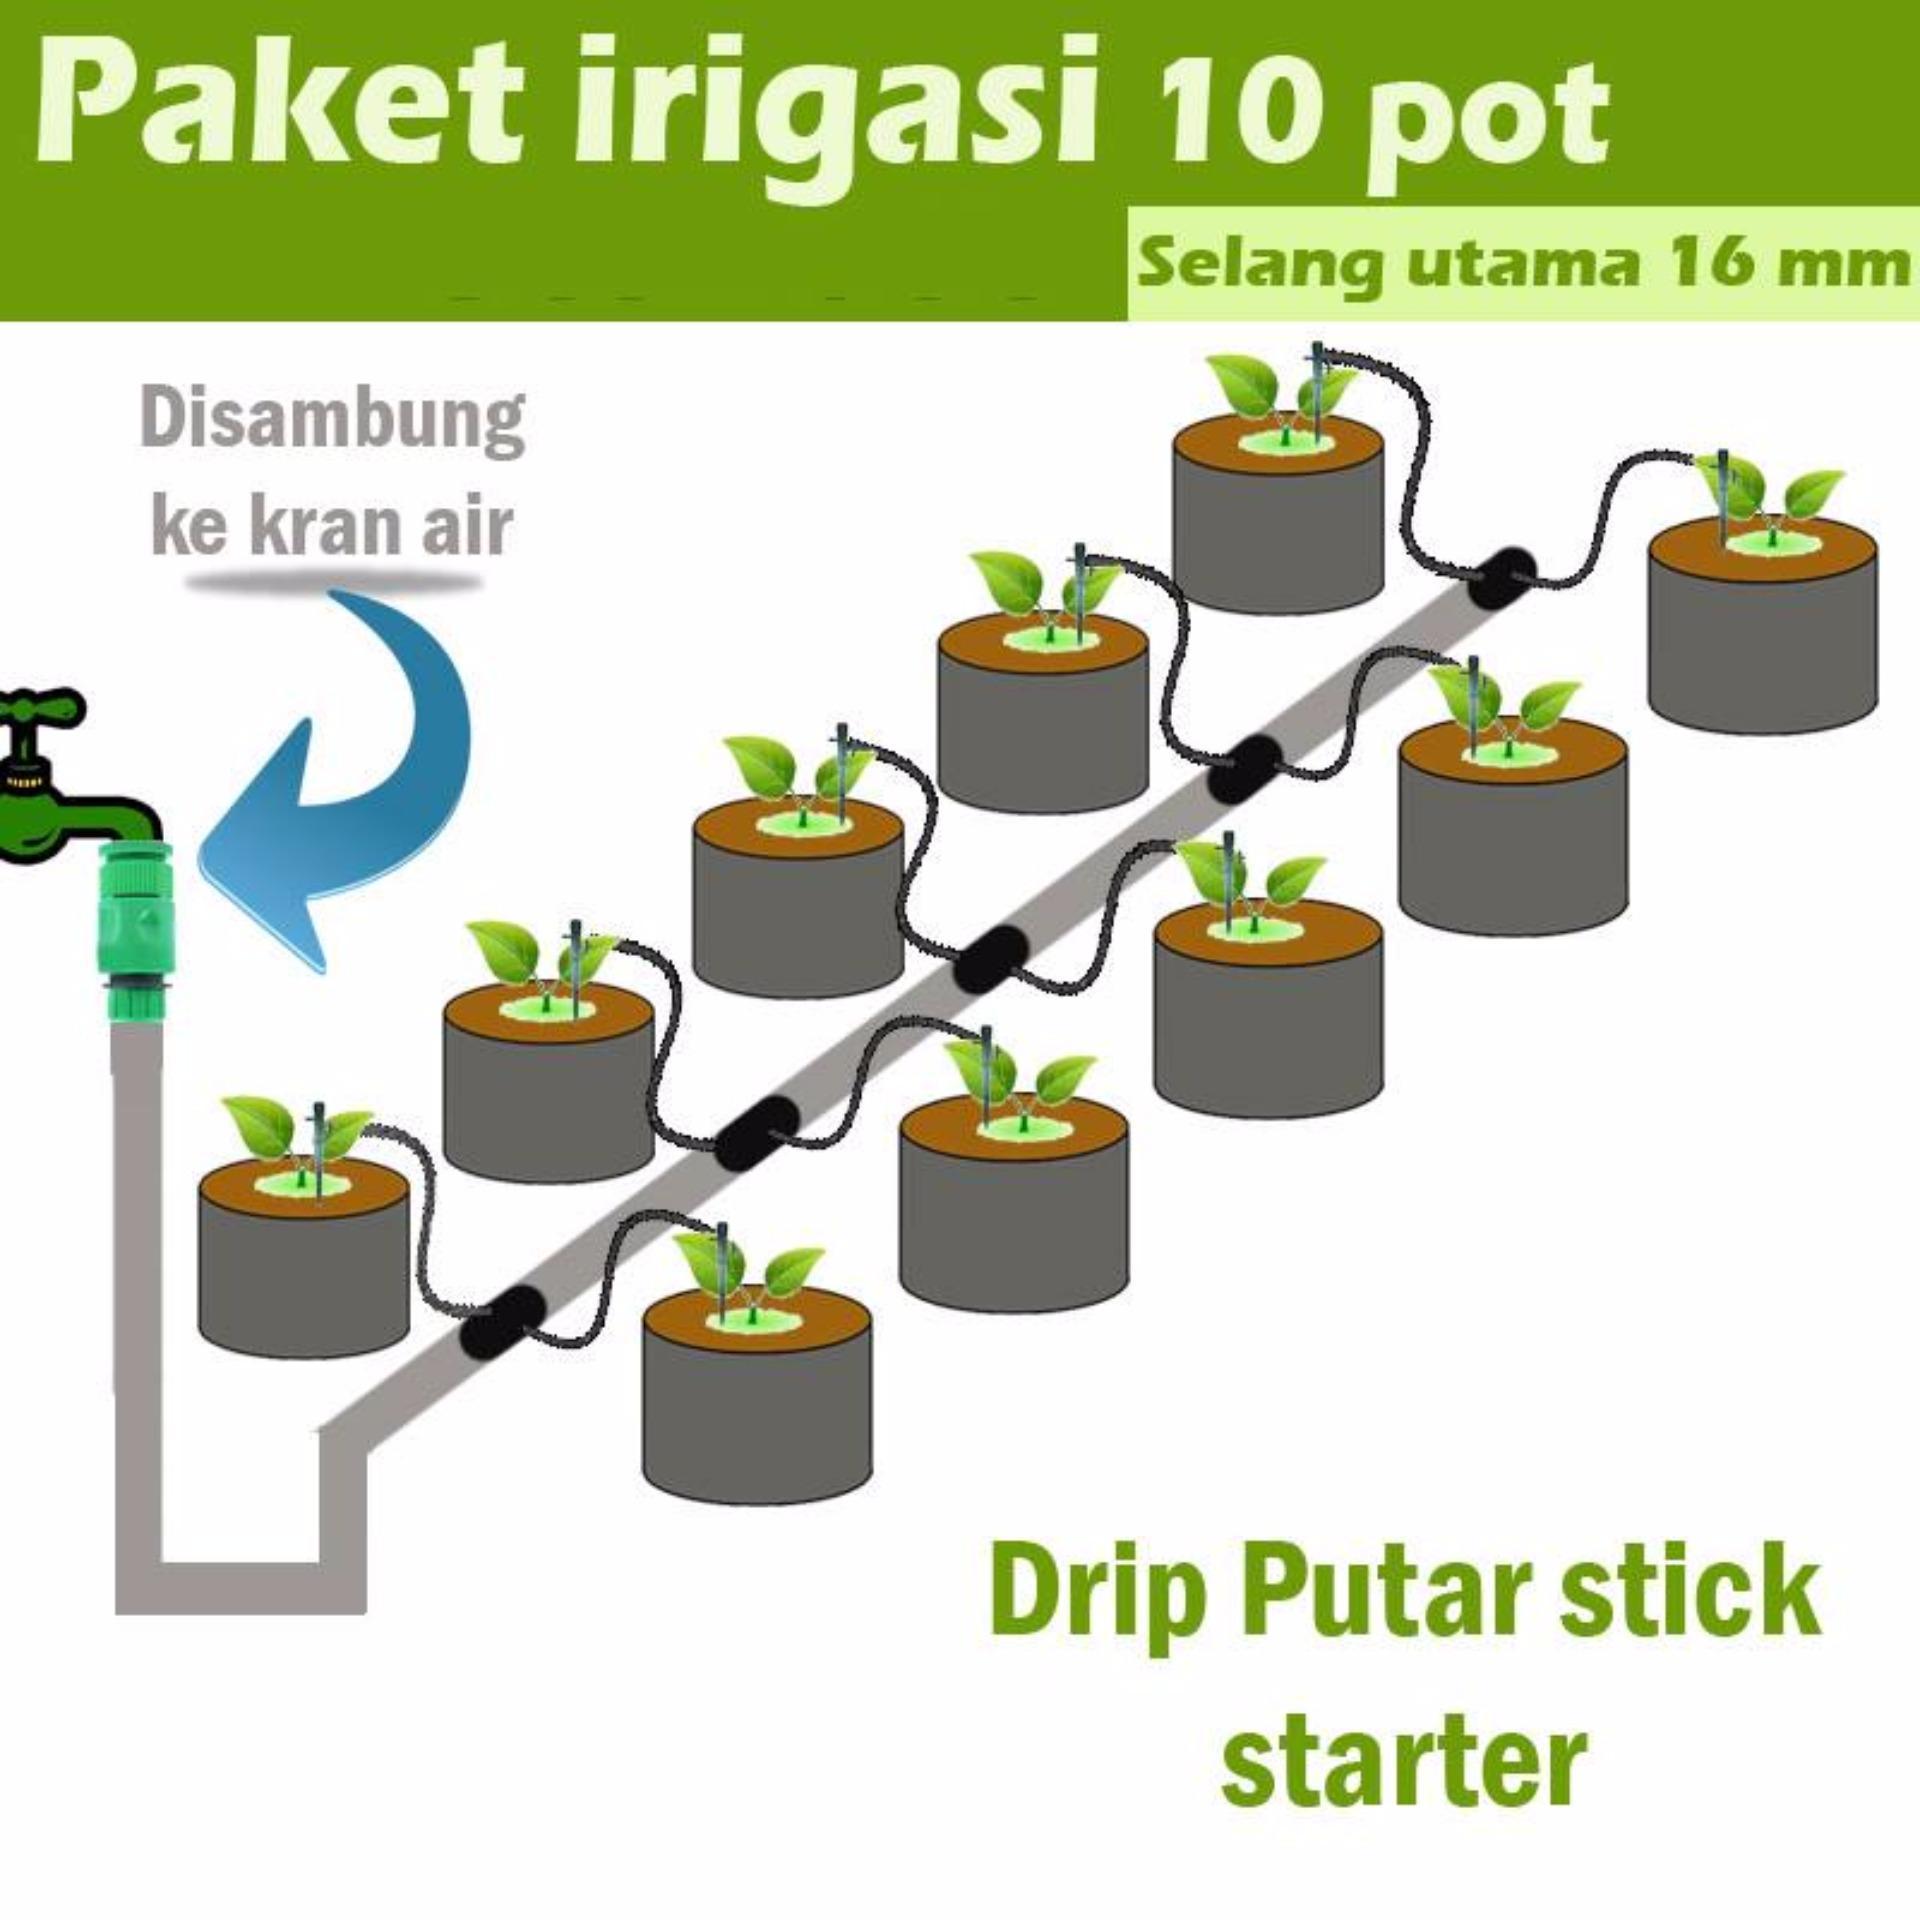 paket irigasi starter drip putar stick 16mm